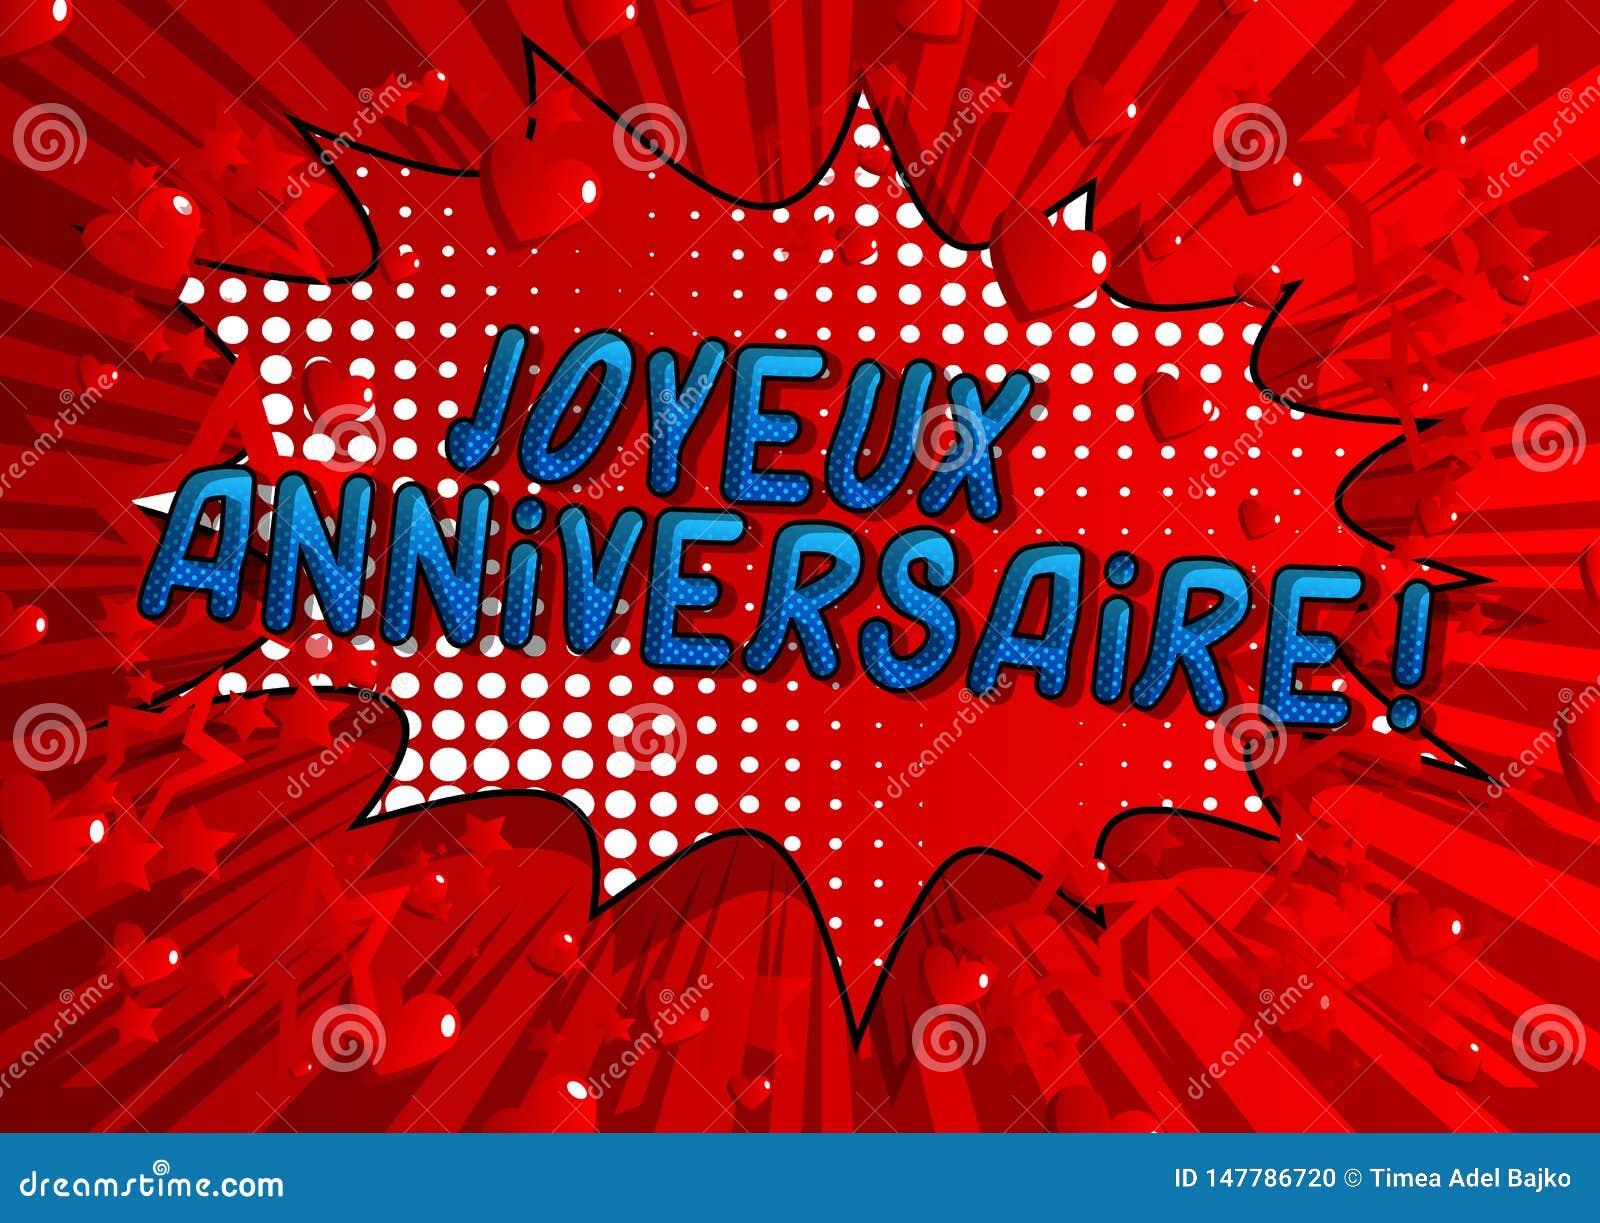 Joyeux Anniversaire! Happy Birthday In French Stock Vector